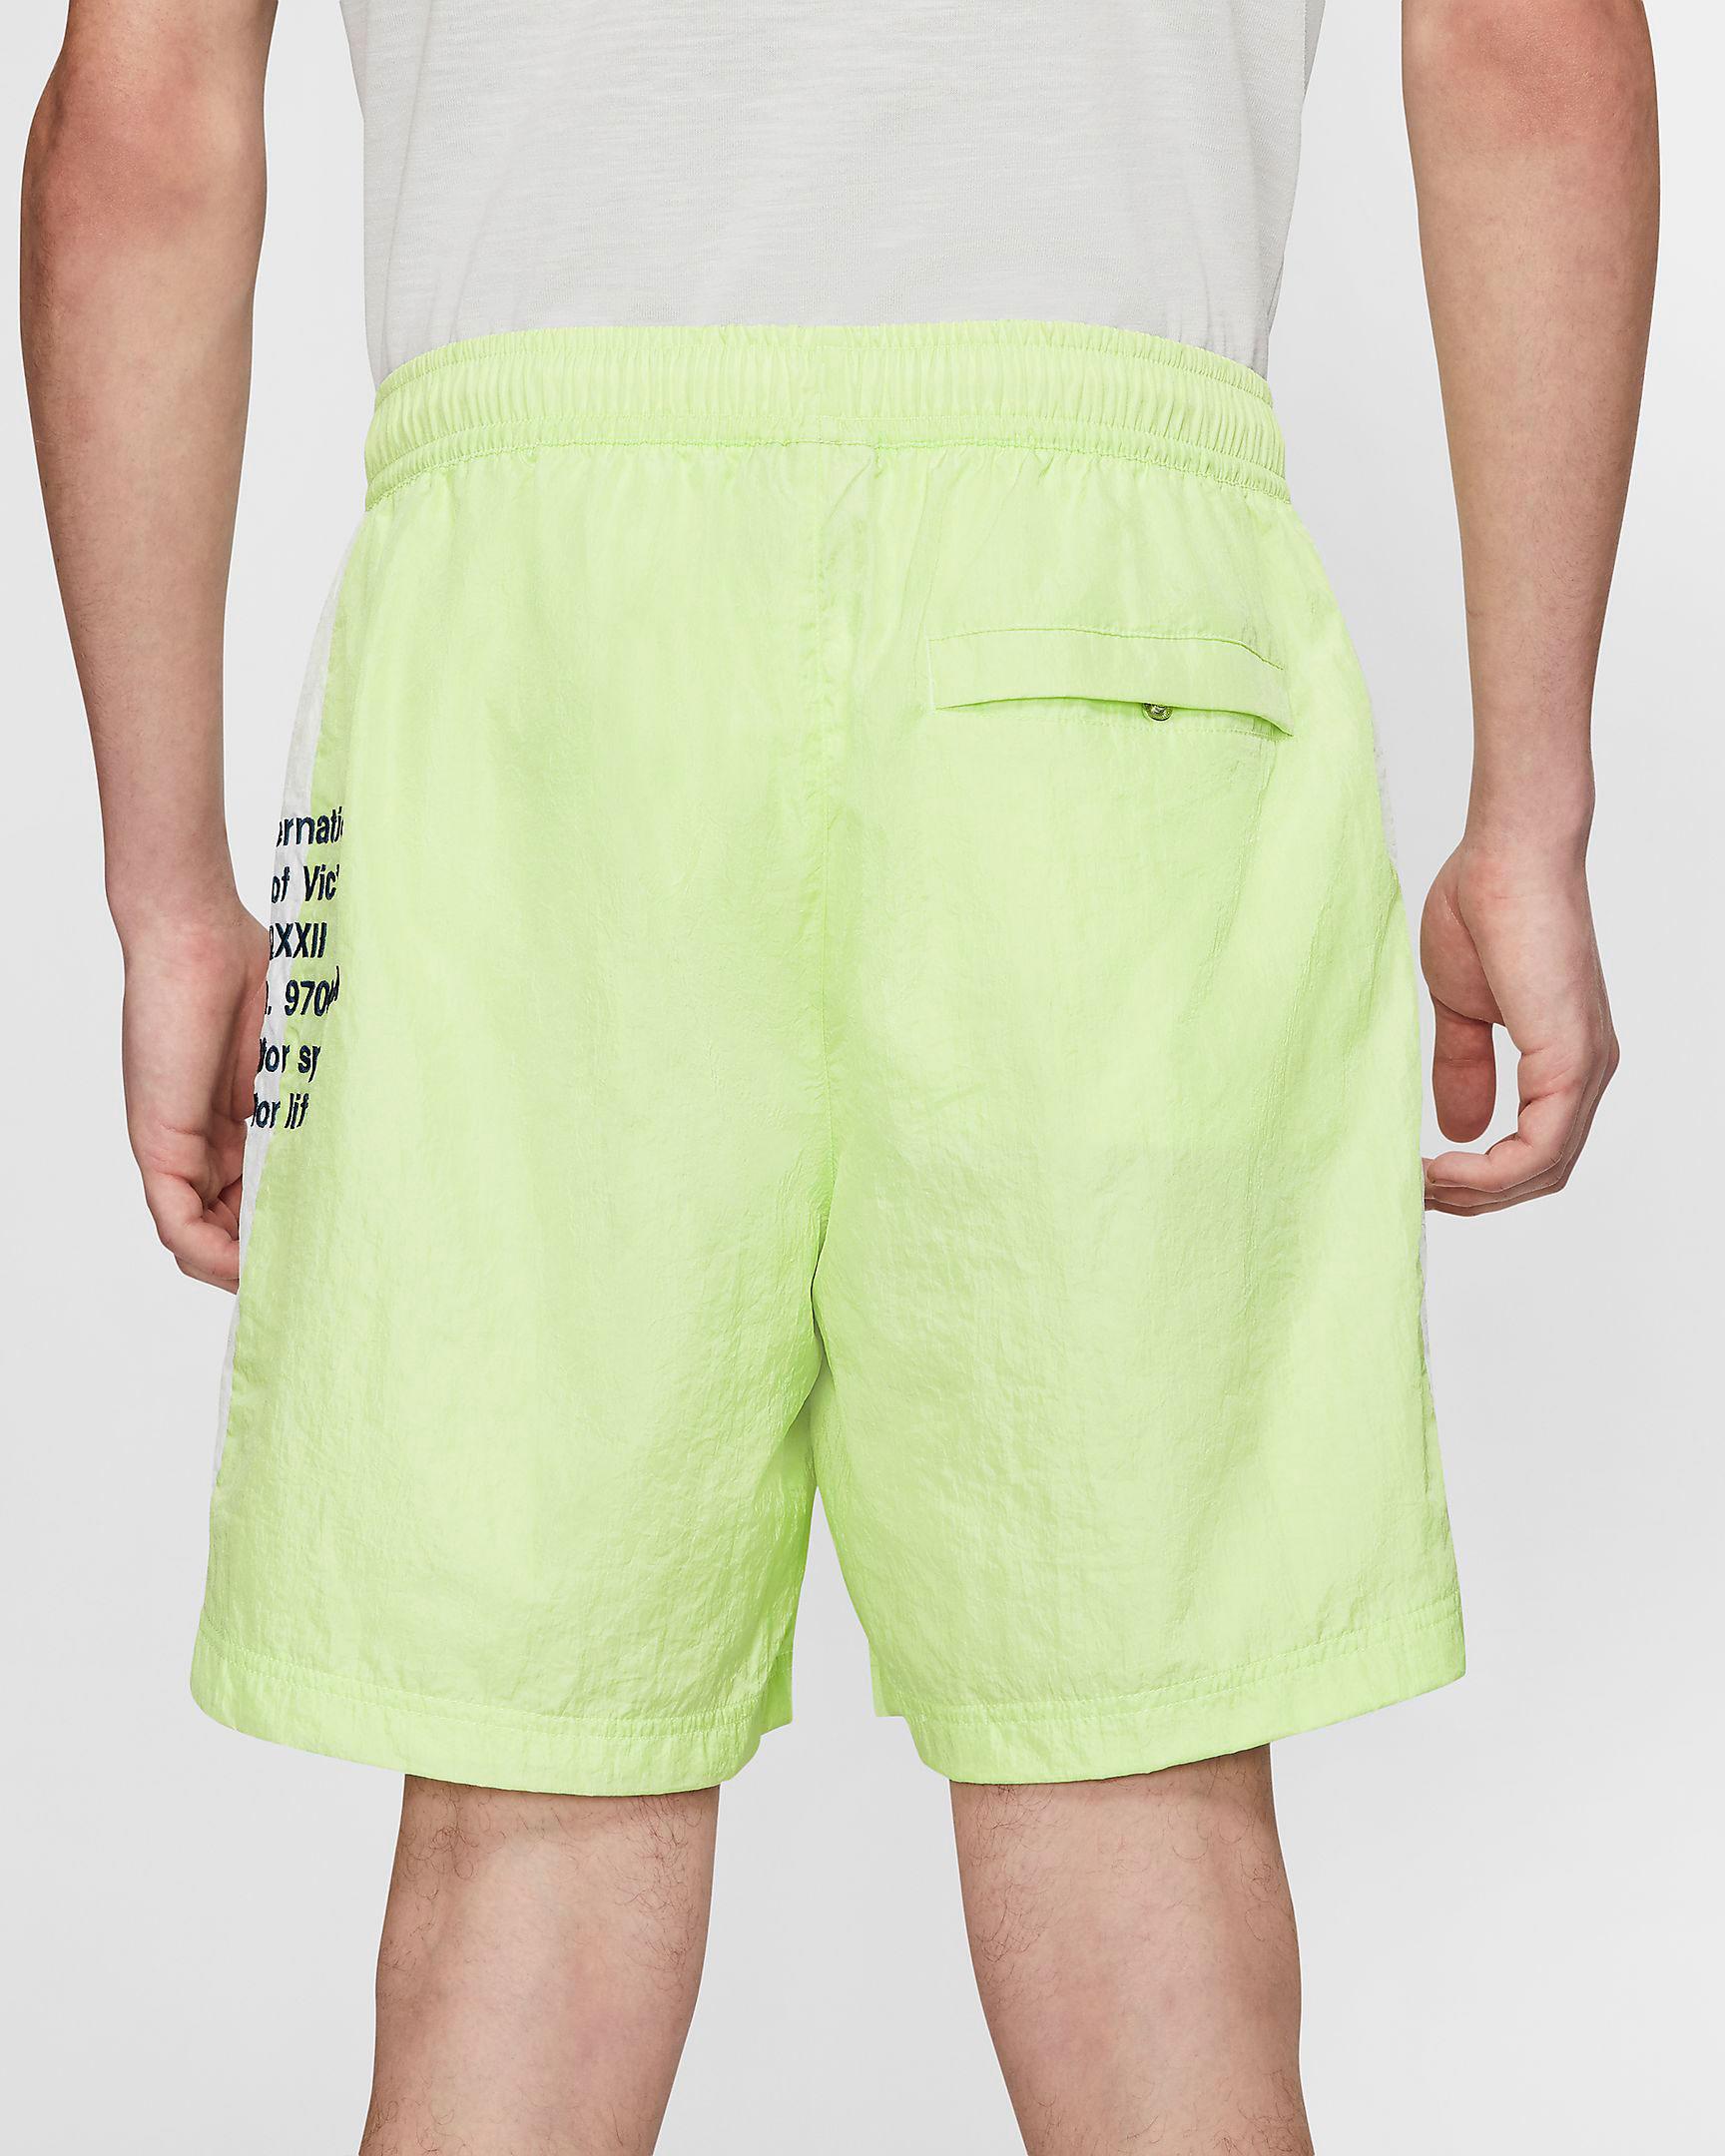 nike-swoosh-woven-shorts-barely-volt-2